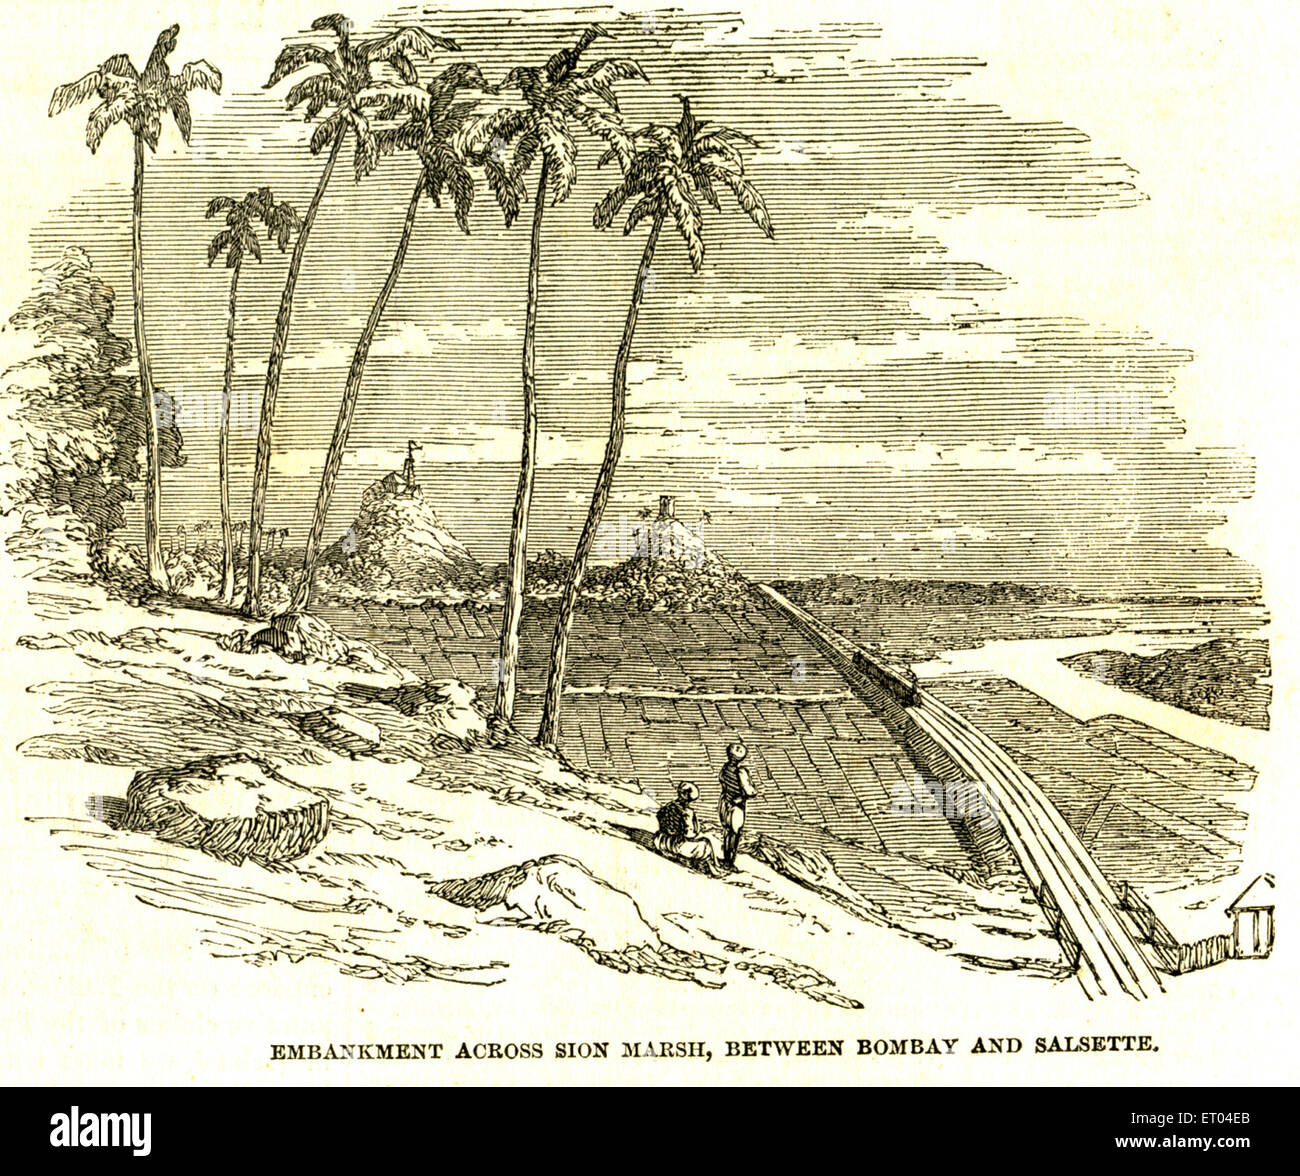 Embankment across Sion Marsh between Bombay and Salsette now New Mumbai ; 4th June 1853 ; Maharashtra ; India - Stock Image